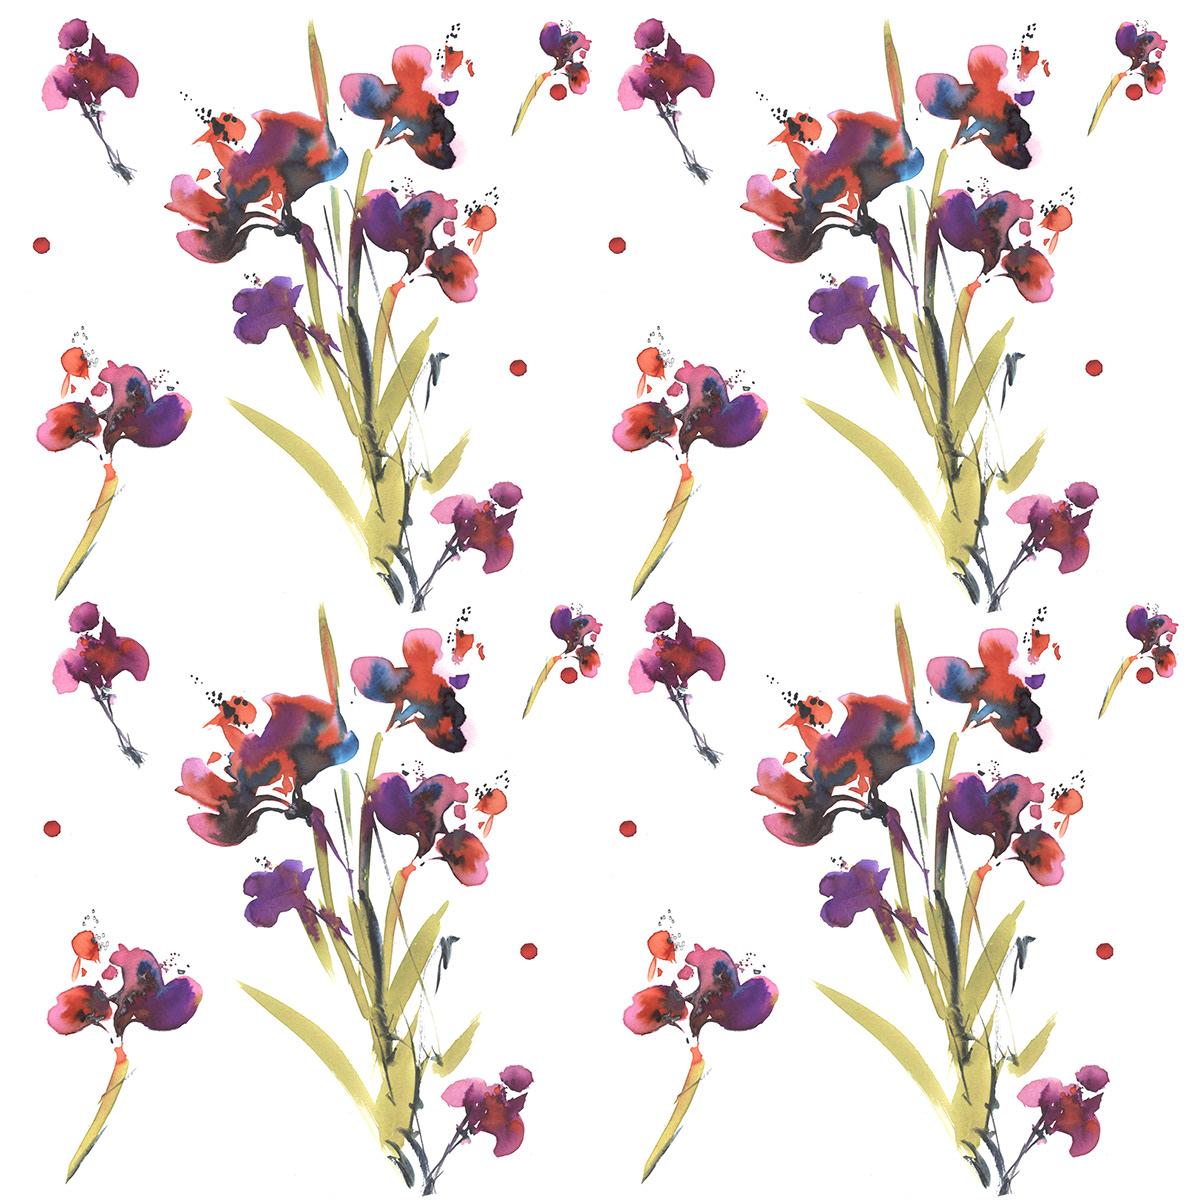 art artist Flowers pattern prints watercolor акварель паттерны принты цветы